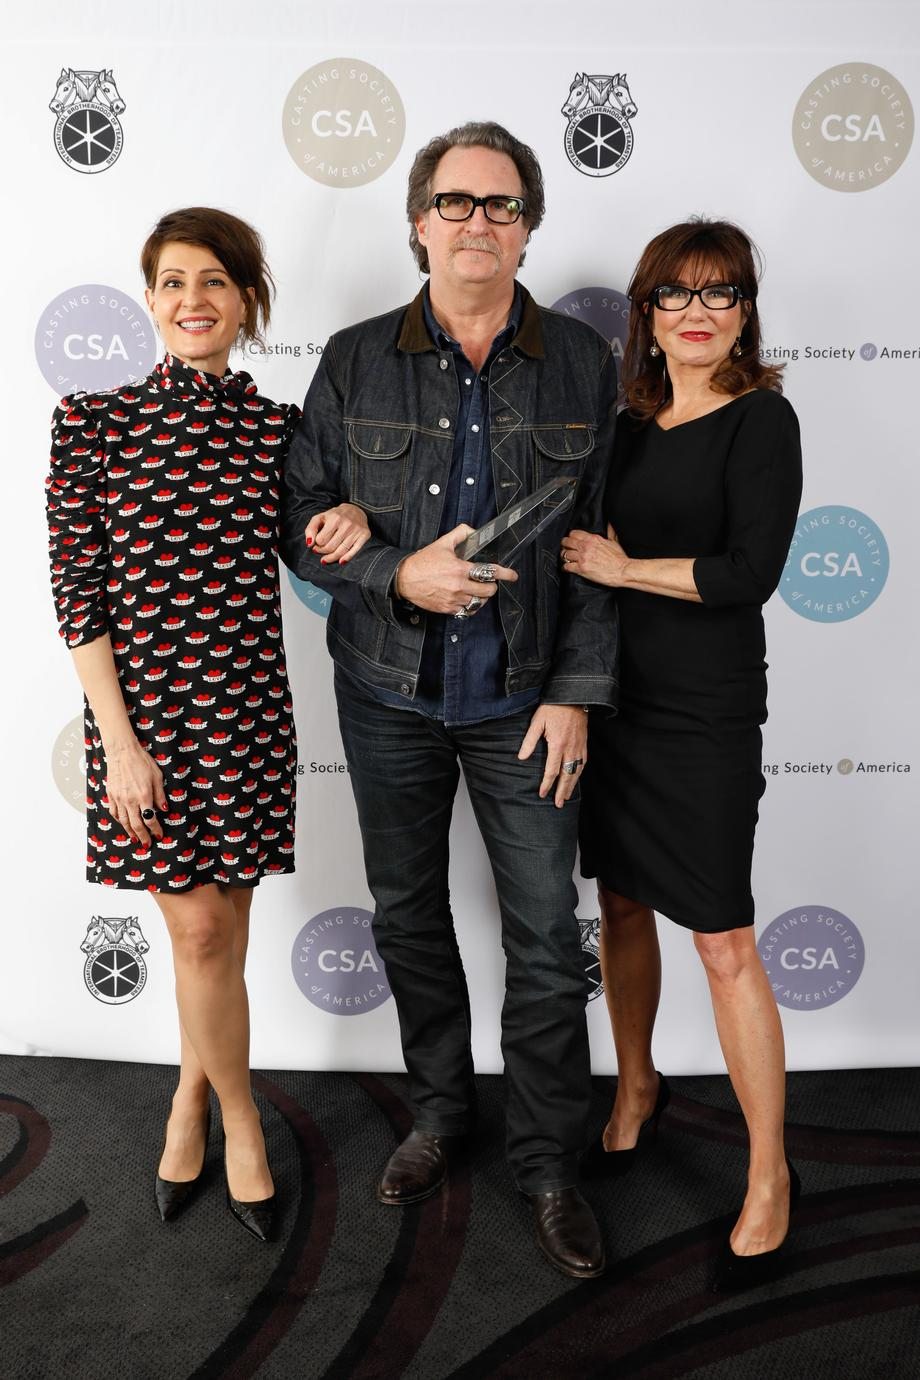 Presenter Nia Vardalos, Winner John Papsidera and presenter Mary McDonnell